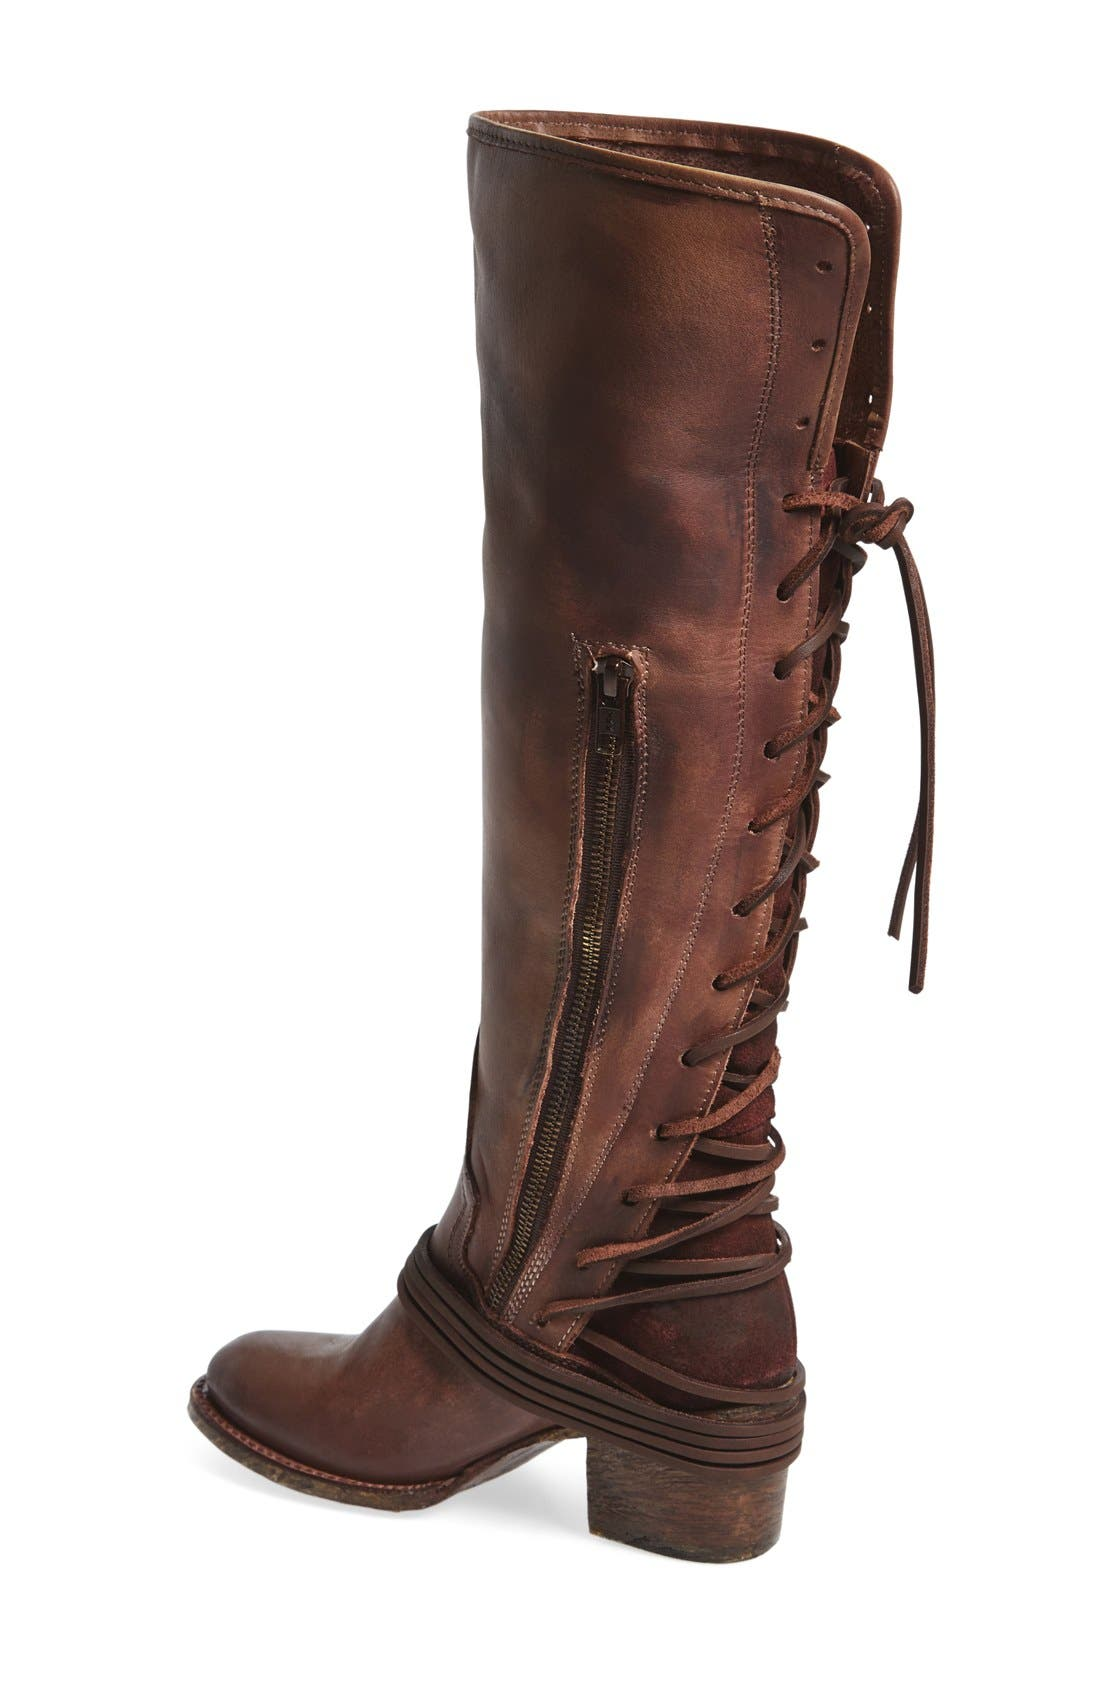 'Coal' Tall Leather Boot,                             Alternate thumbnail 2, color,                             PLUM